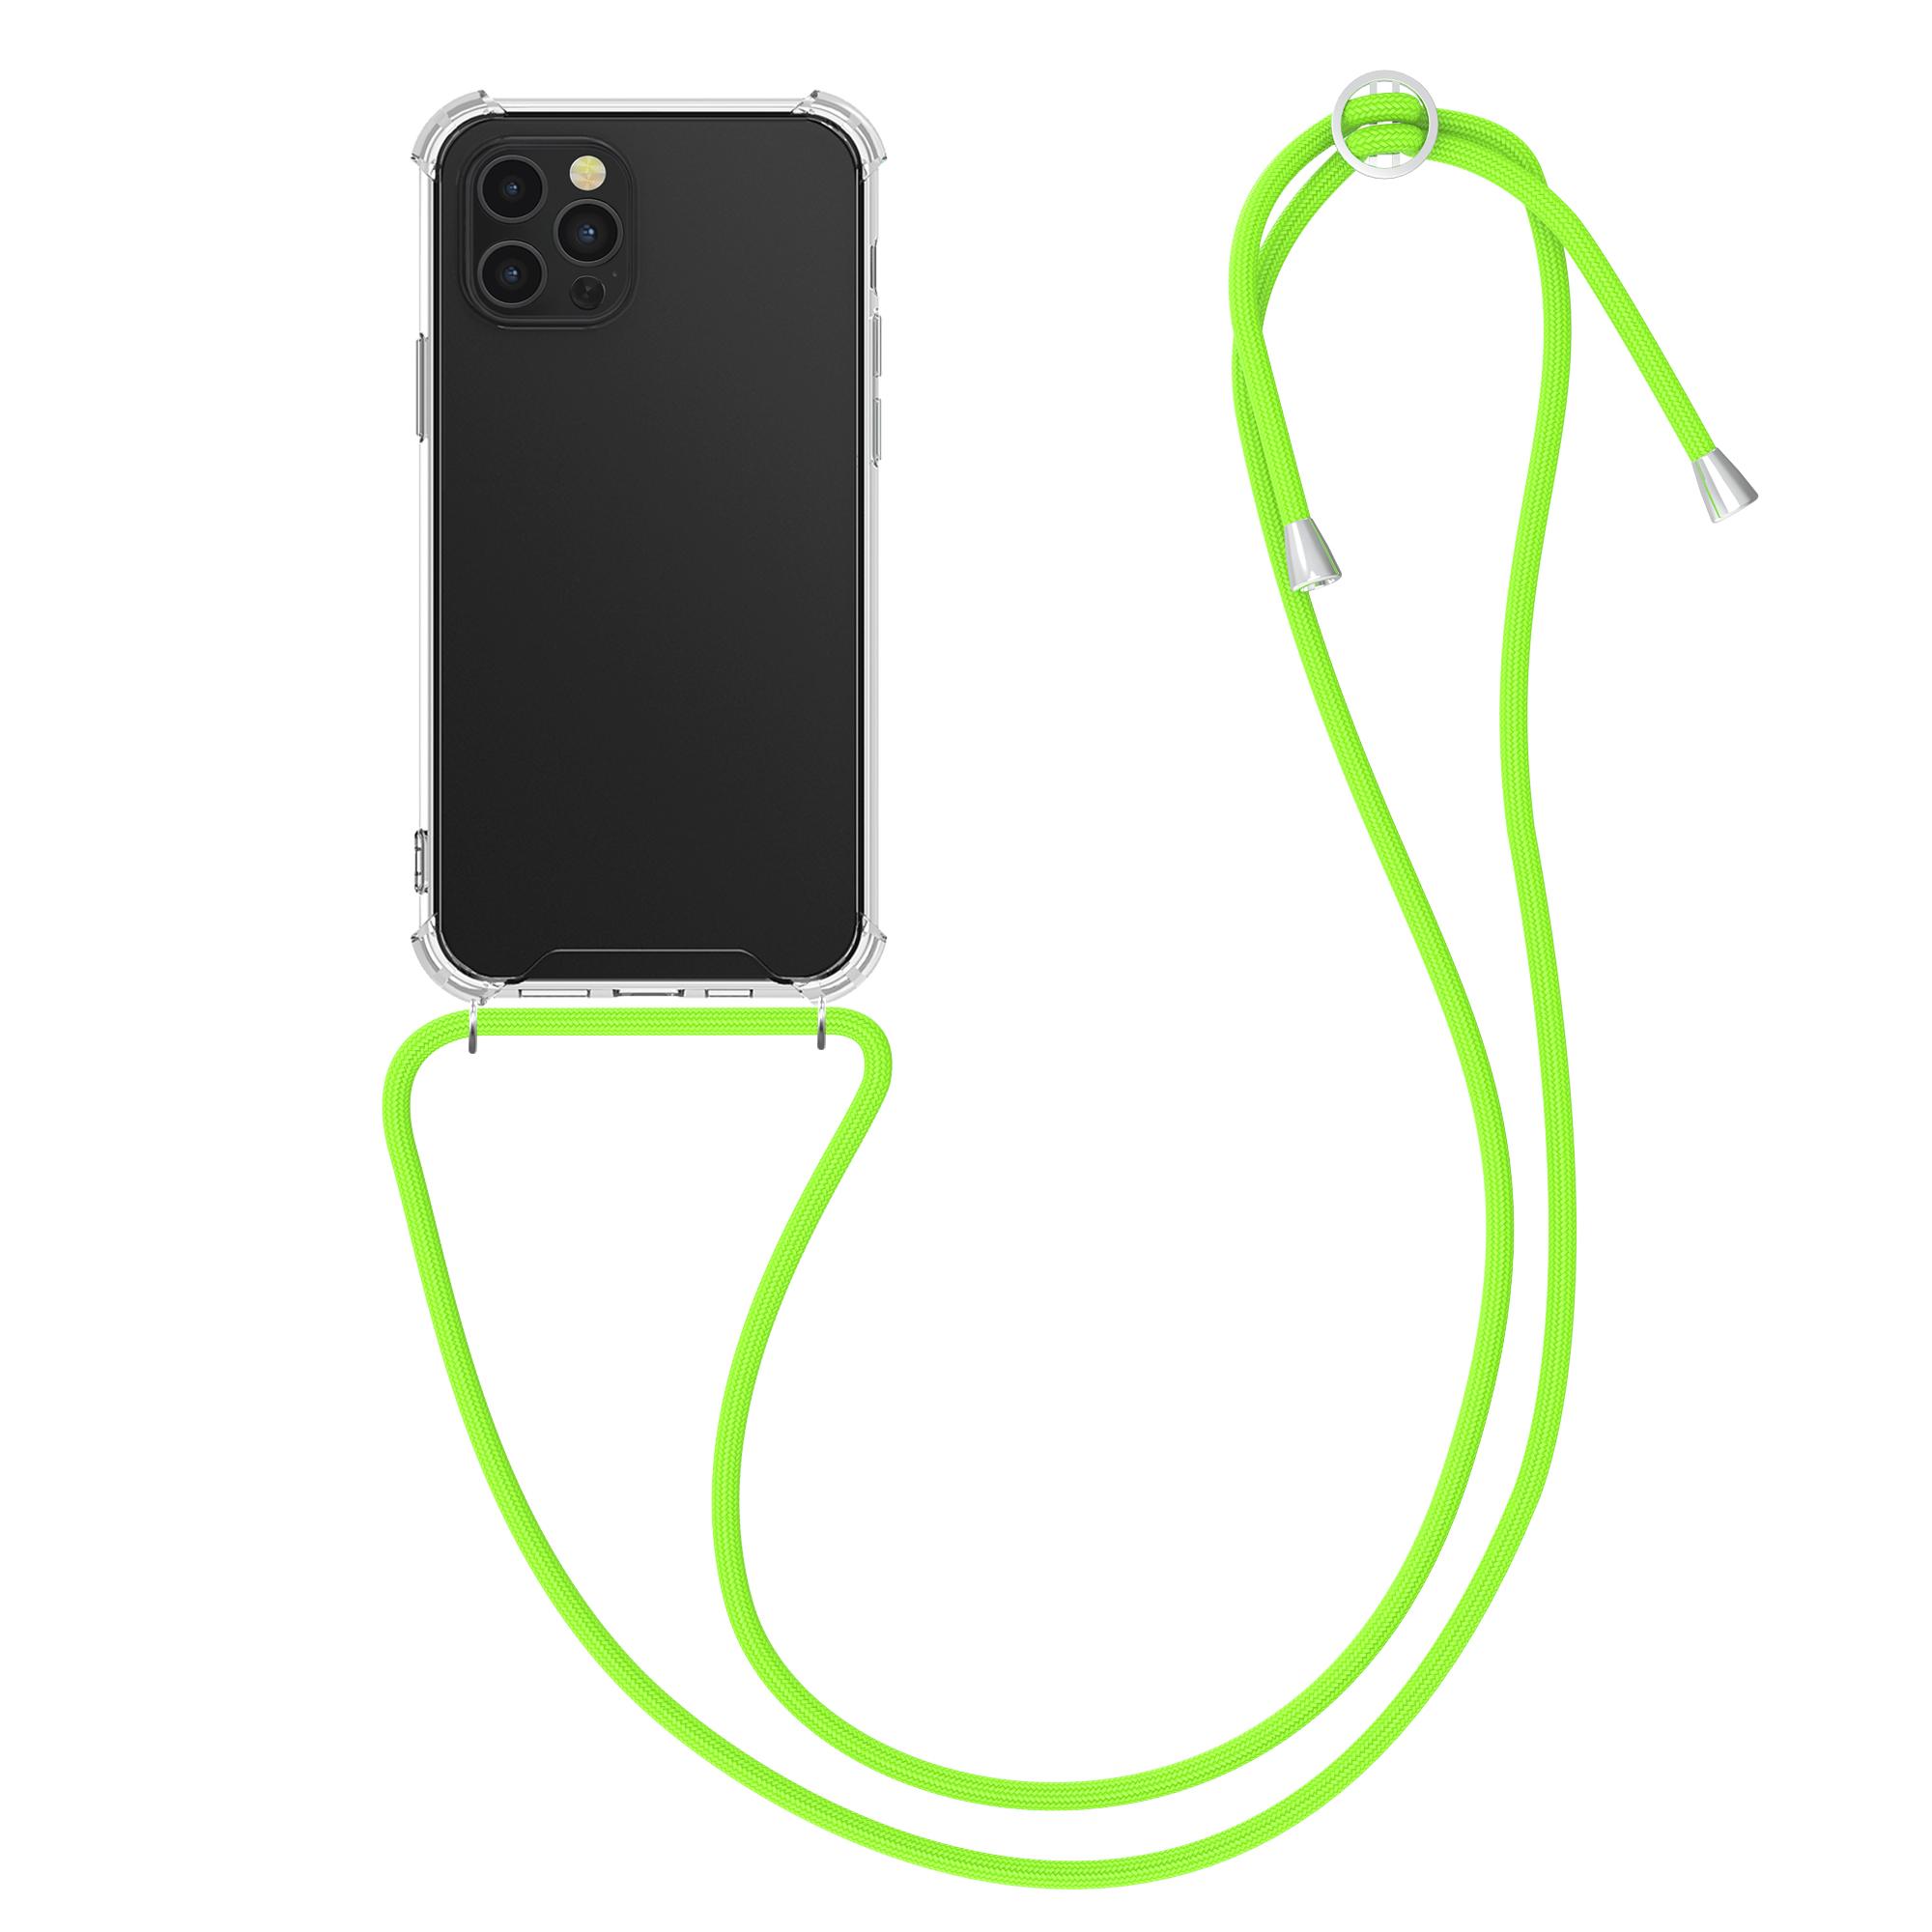 Kvalitní silikonové TPU pouzdro pro Apple iPhone 12 Pro Max - Transparent | Neon Green